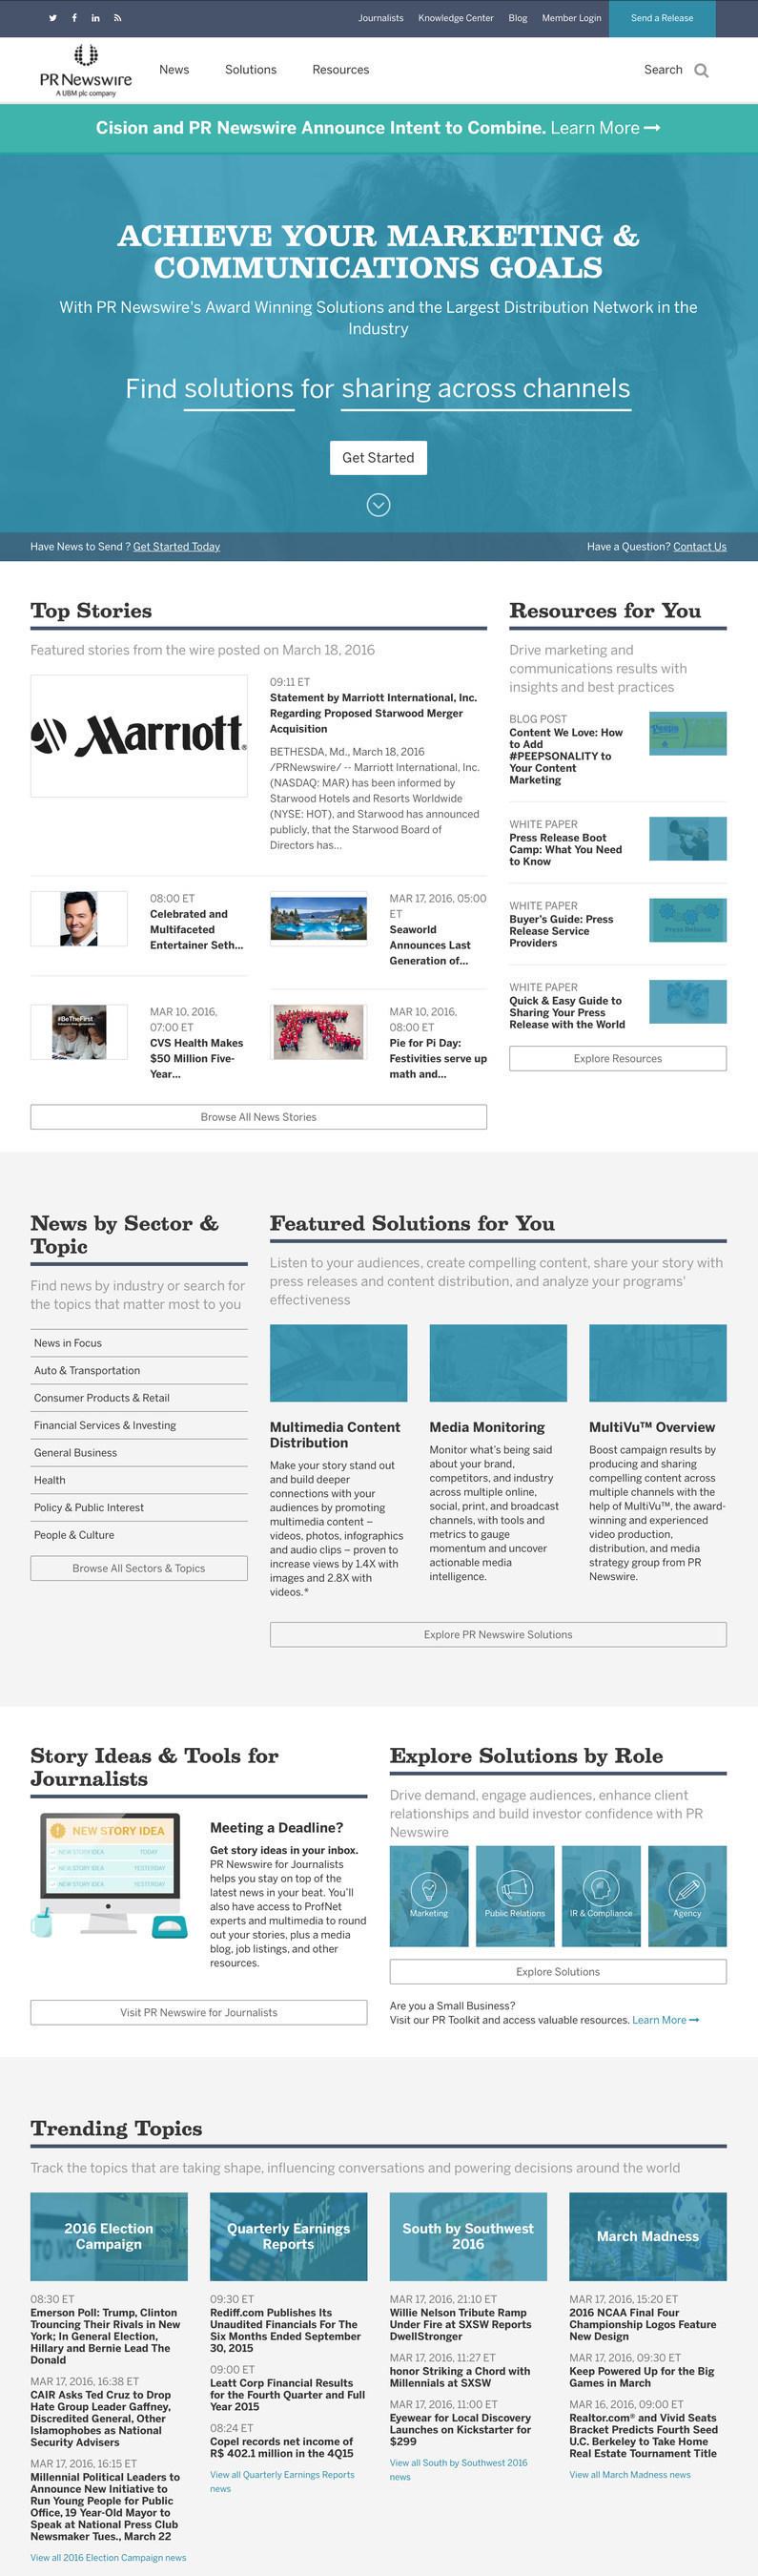 PR Newswire Introduces Redesigned Website